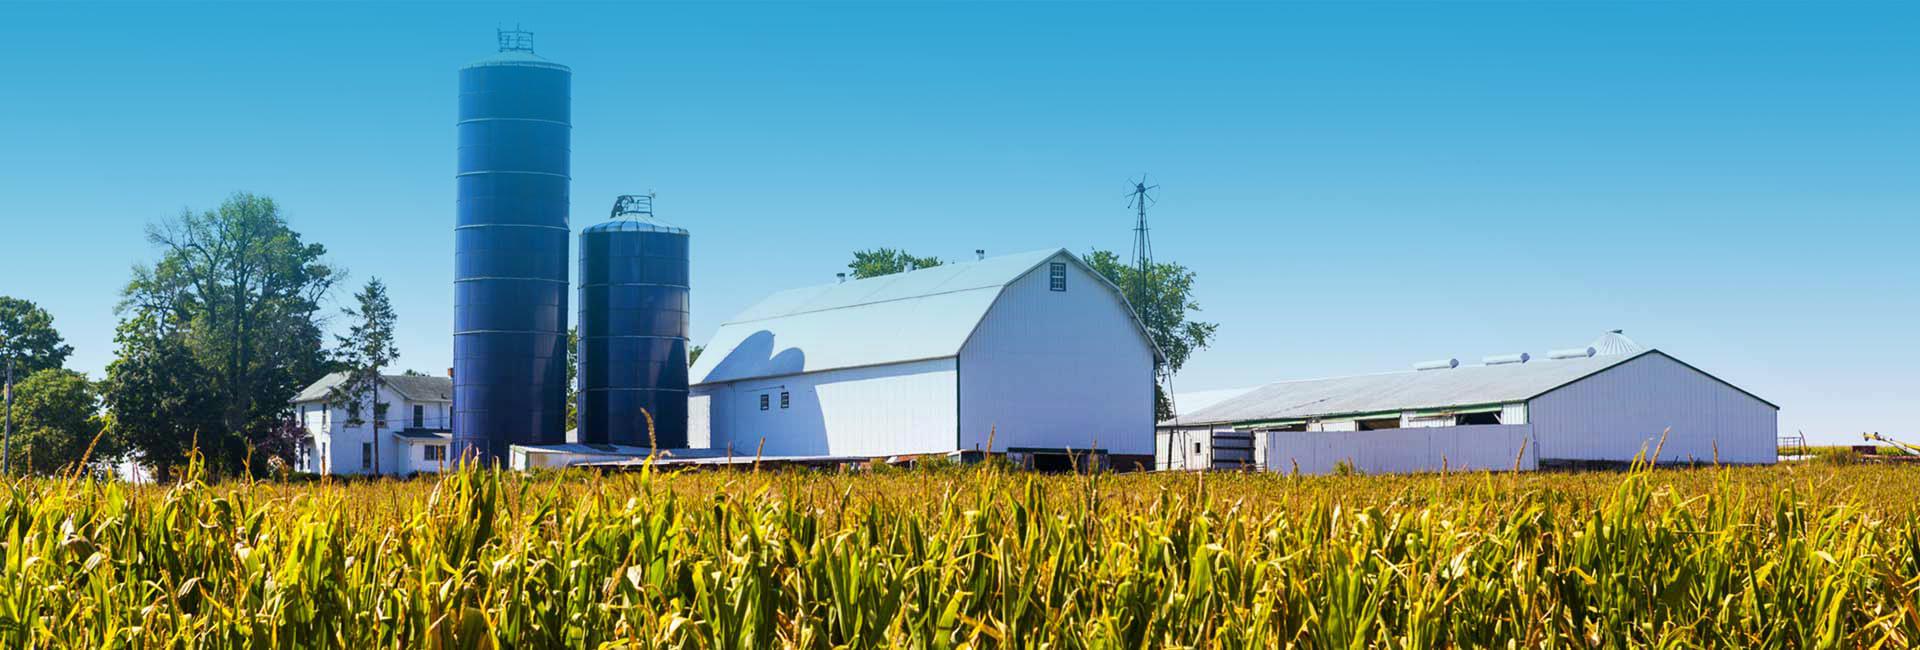 banner-farmland-overlay